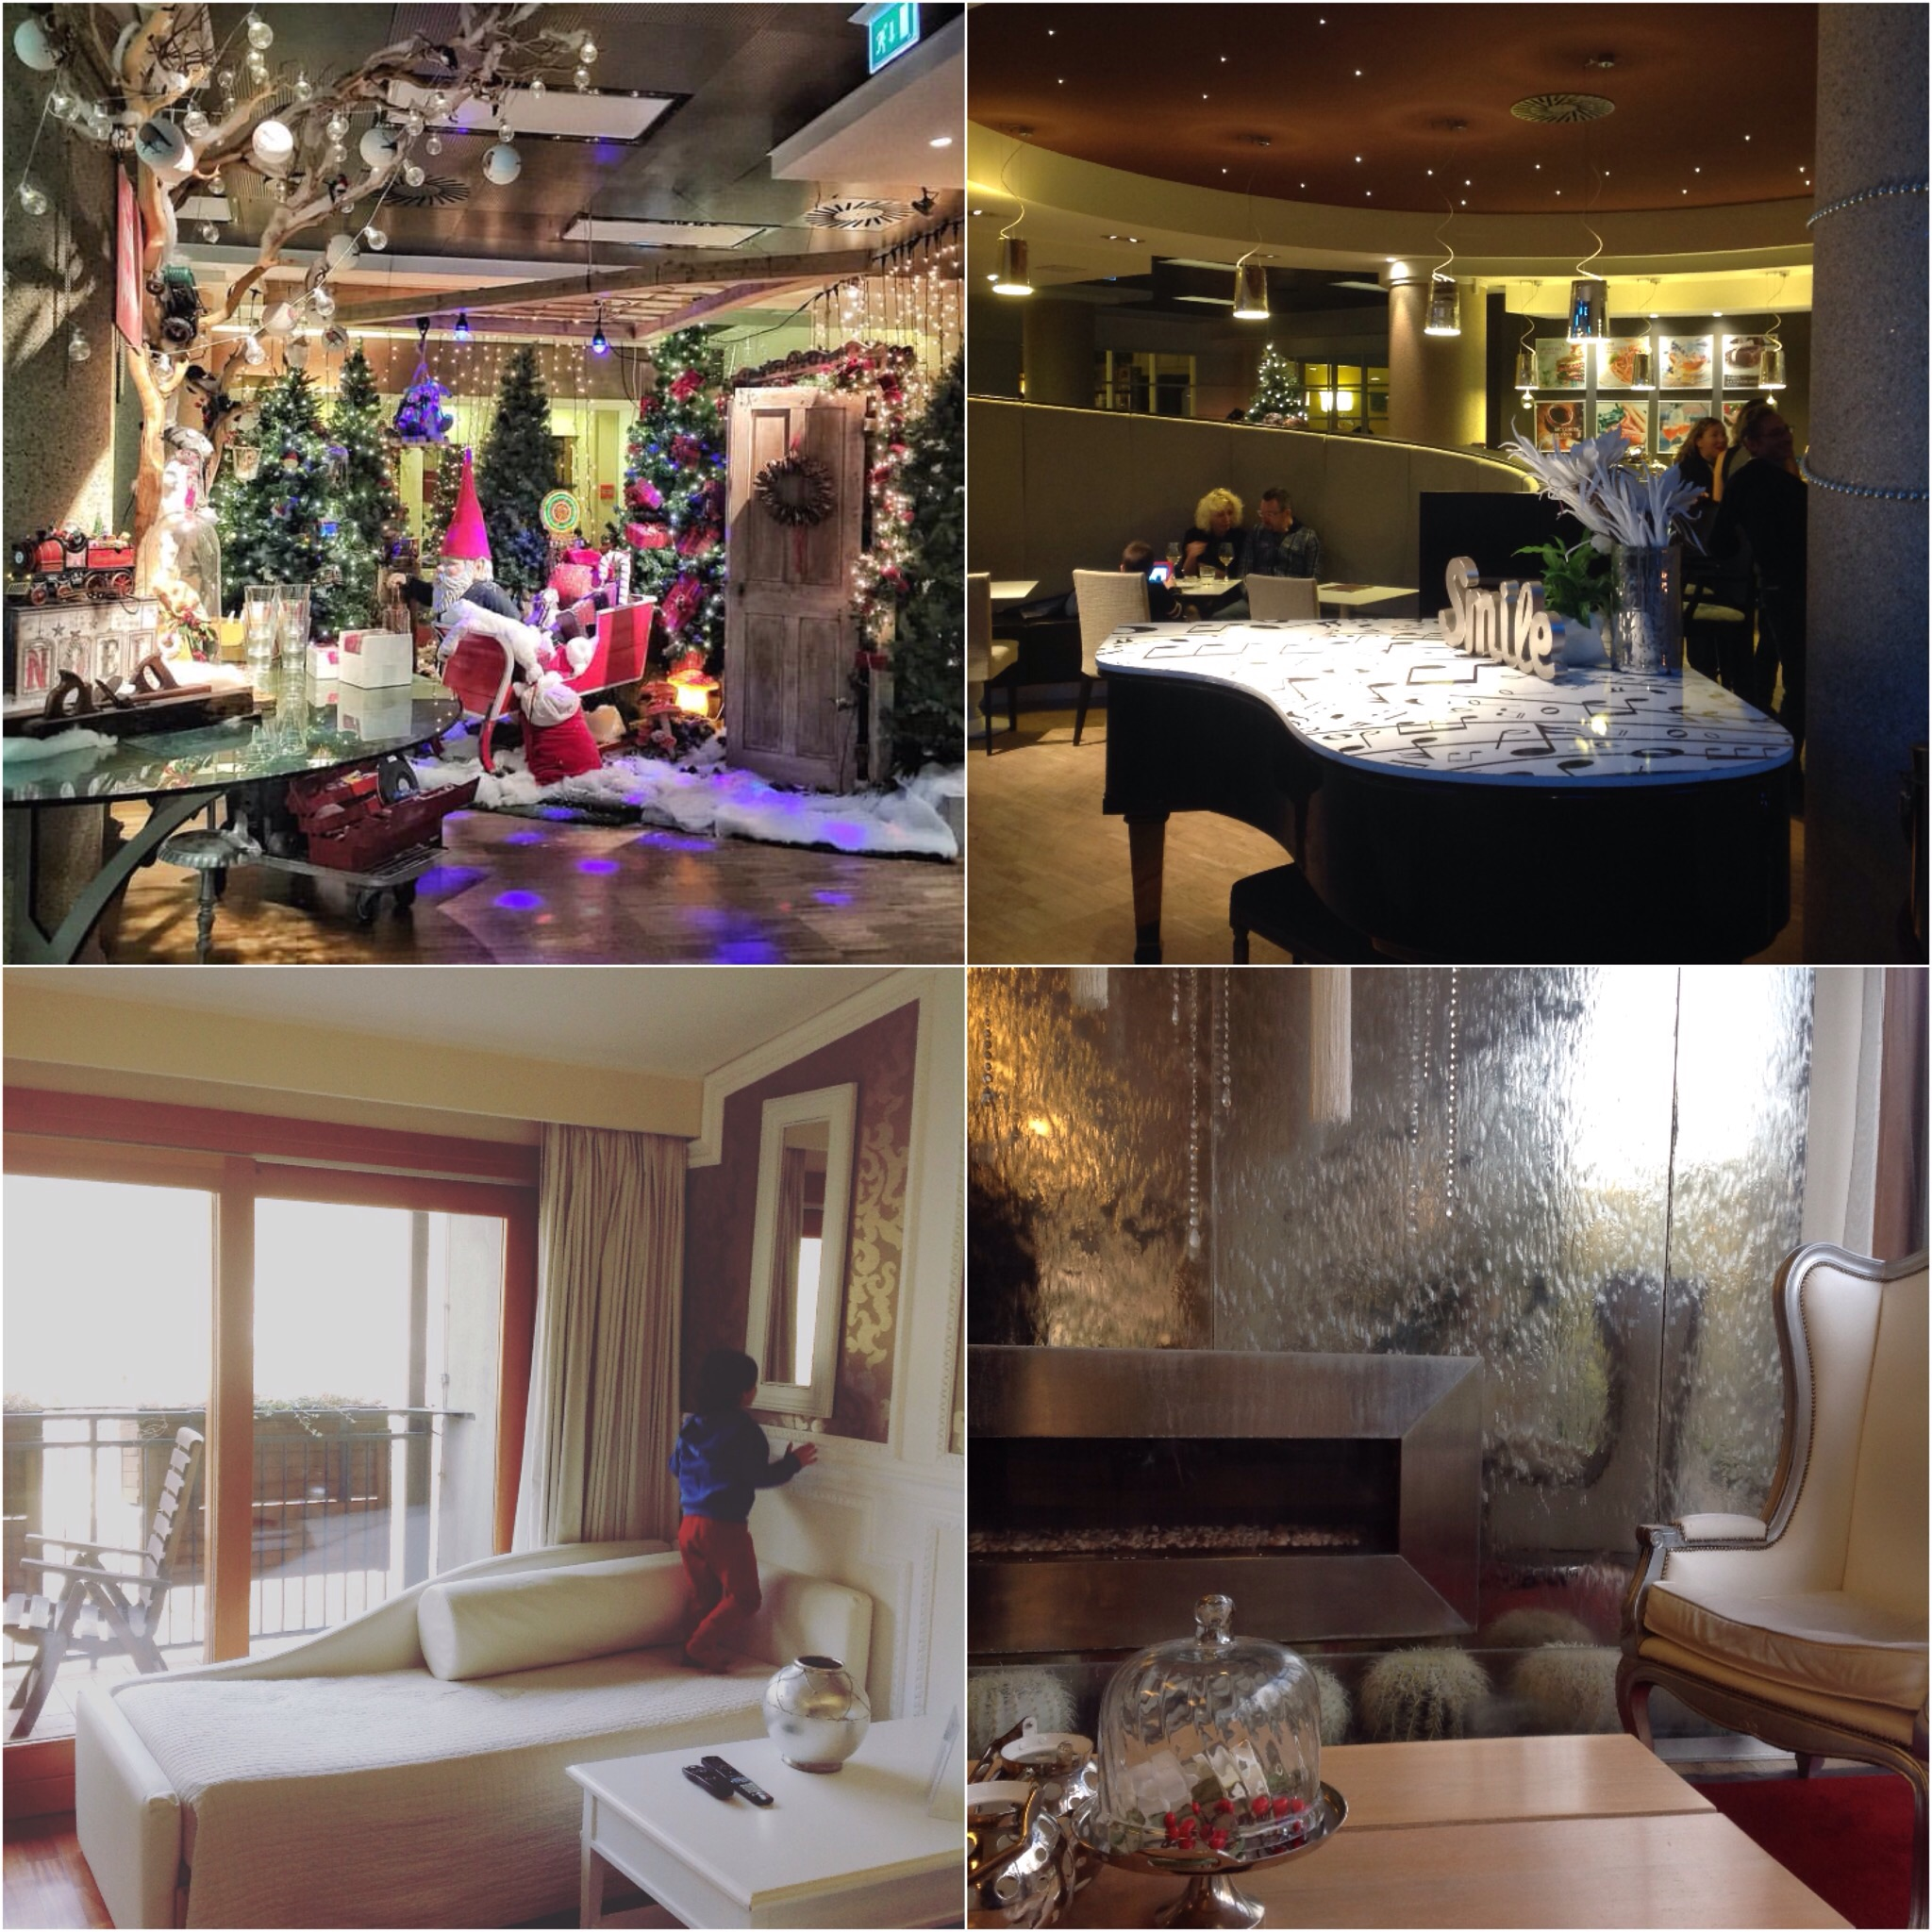 Ròseo Euroterme Resort a Bagno di Romagna: terme a misura di ...